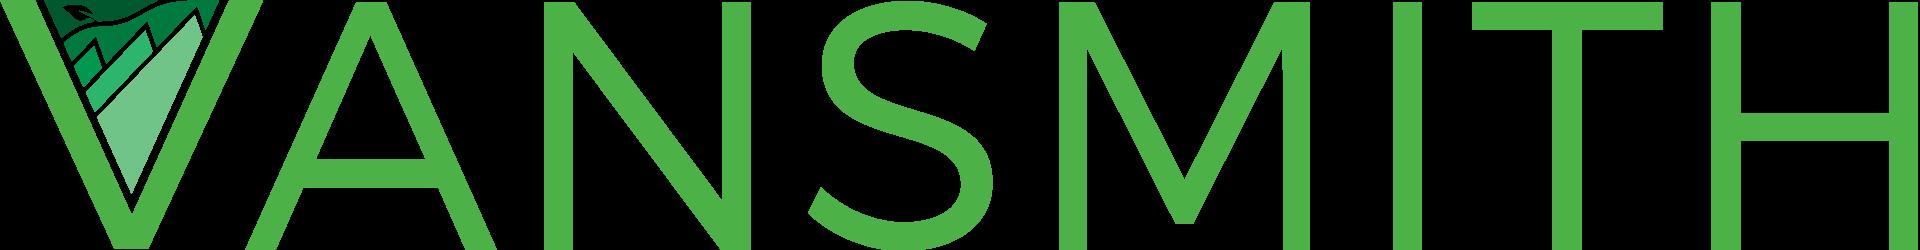 The Vansmith Green Package Logo - Sustainable Camper Van Conversion